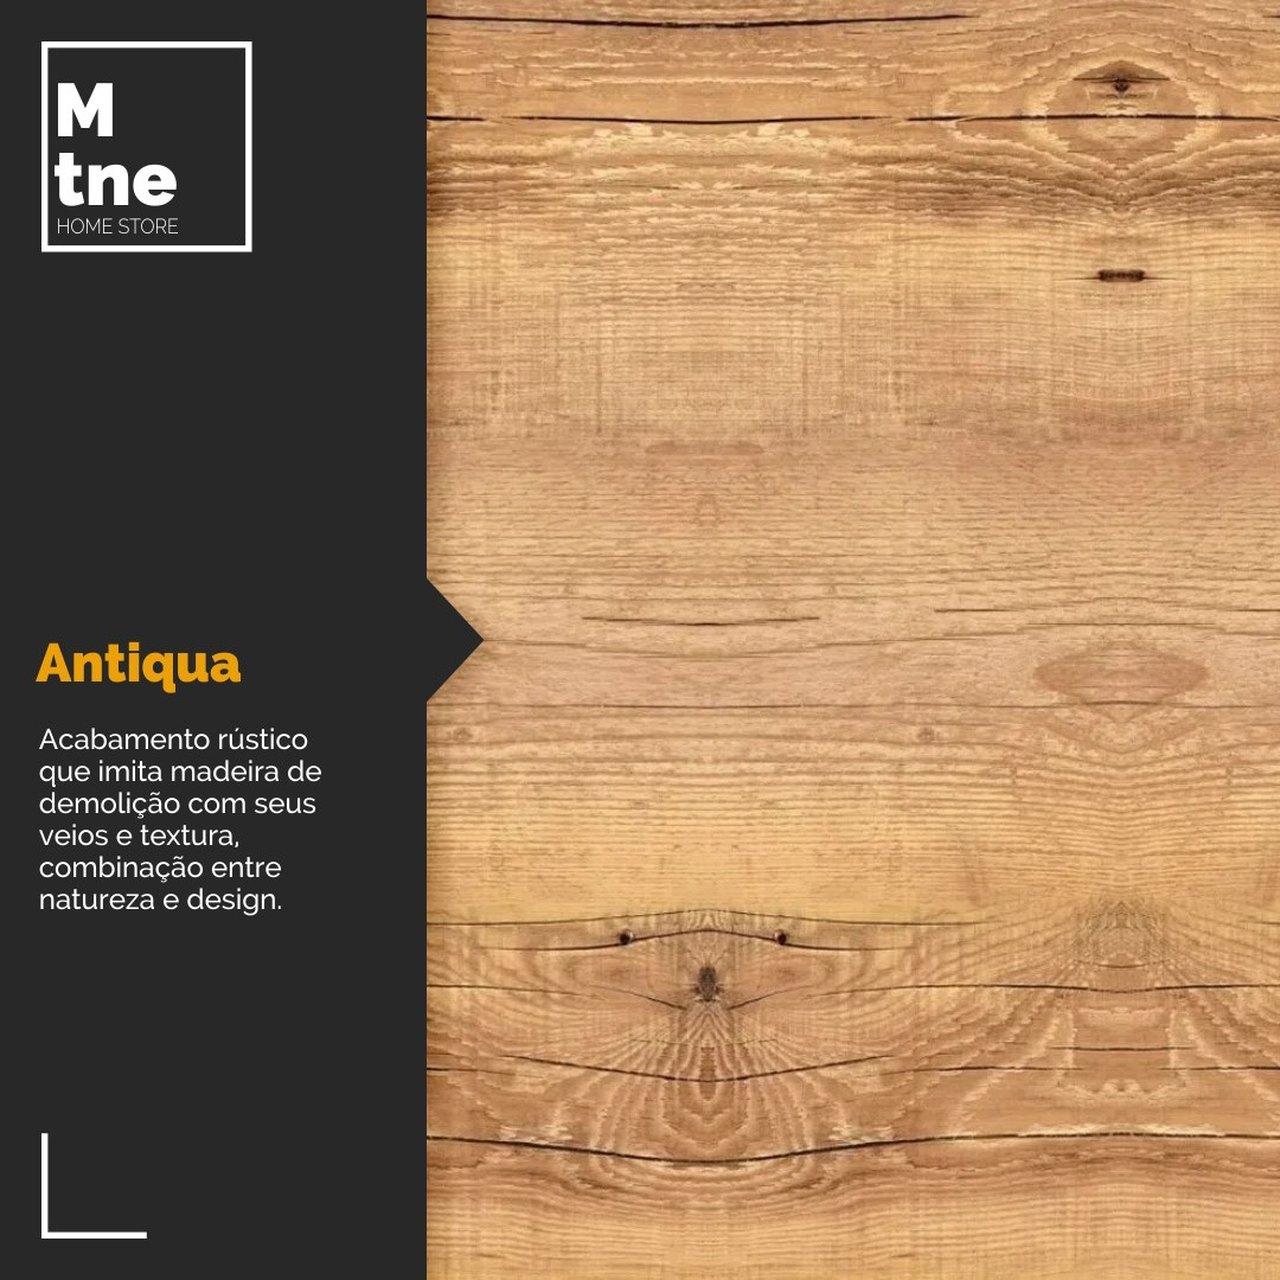 Banco Antiqua com Squared Legs e Tampo 100% MDF  - Mtne Store